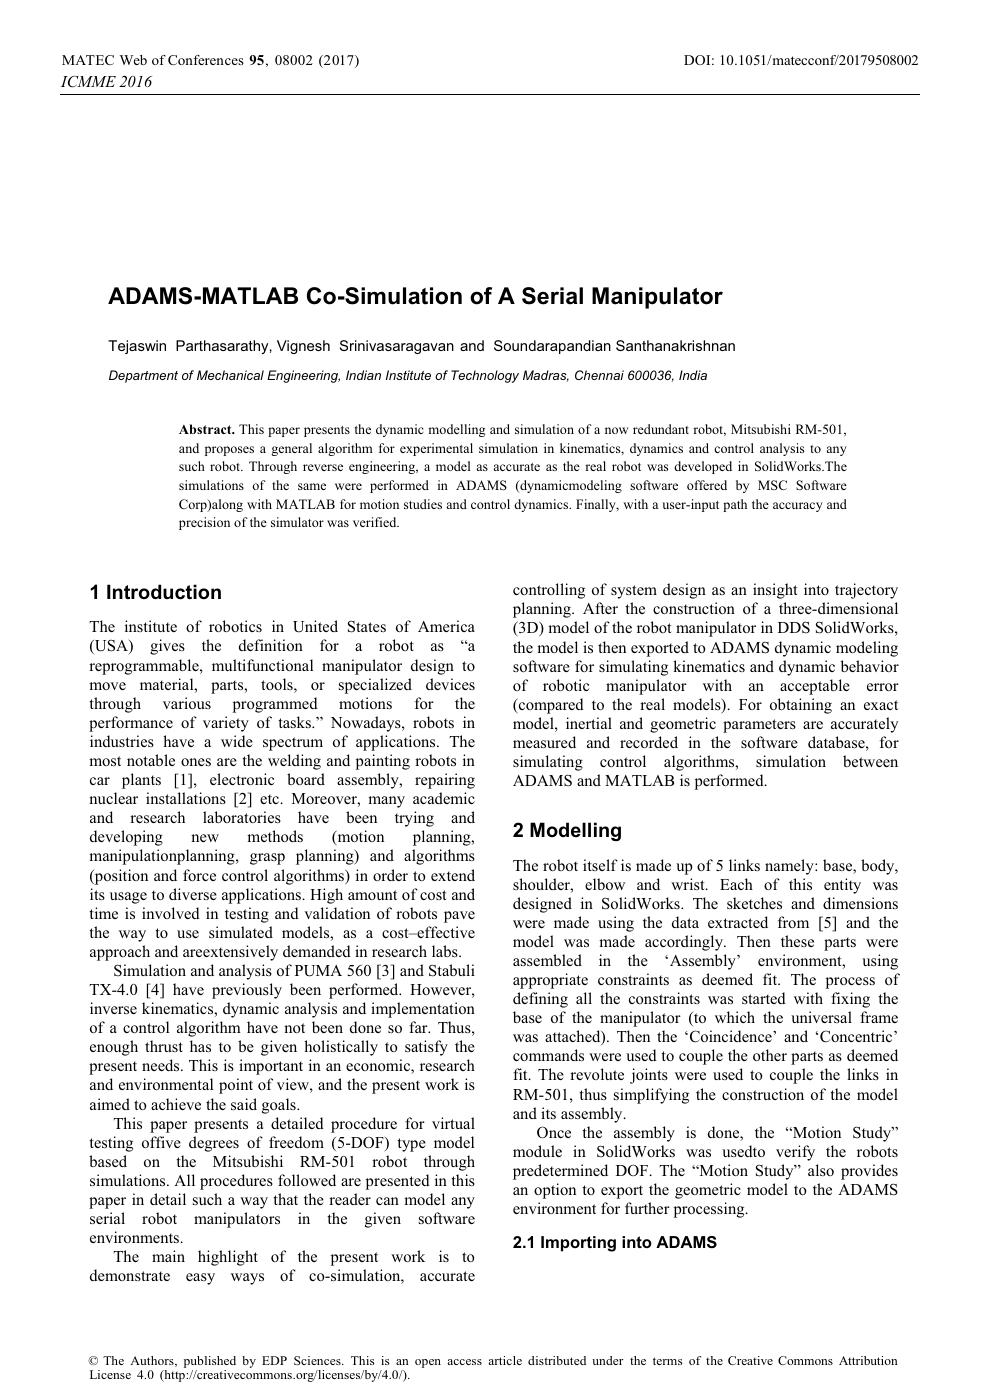 ADAMS-MATLAB Co-Simulation of A Serial Manipulator – topic